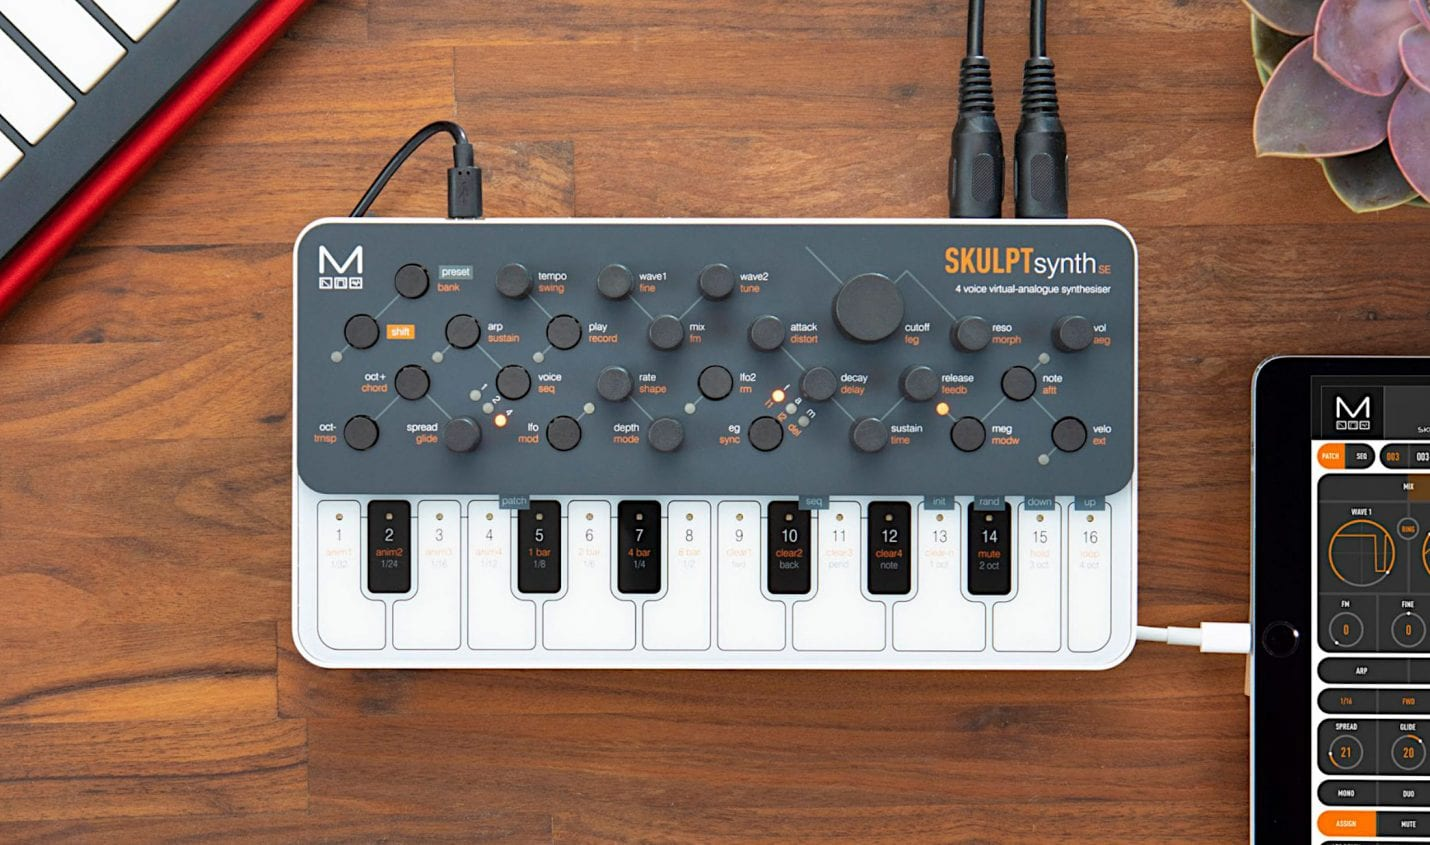 SKULPTsynth SE: Vierstimmiger VA-Synthesizer von Modal Electronics